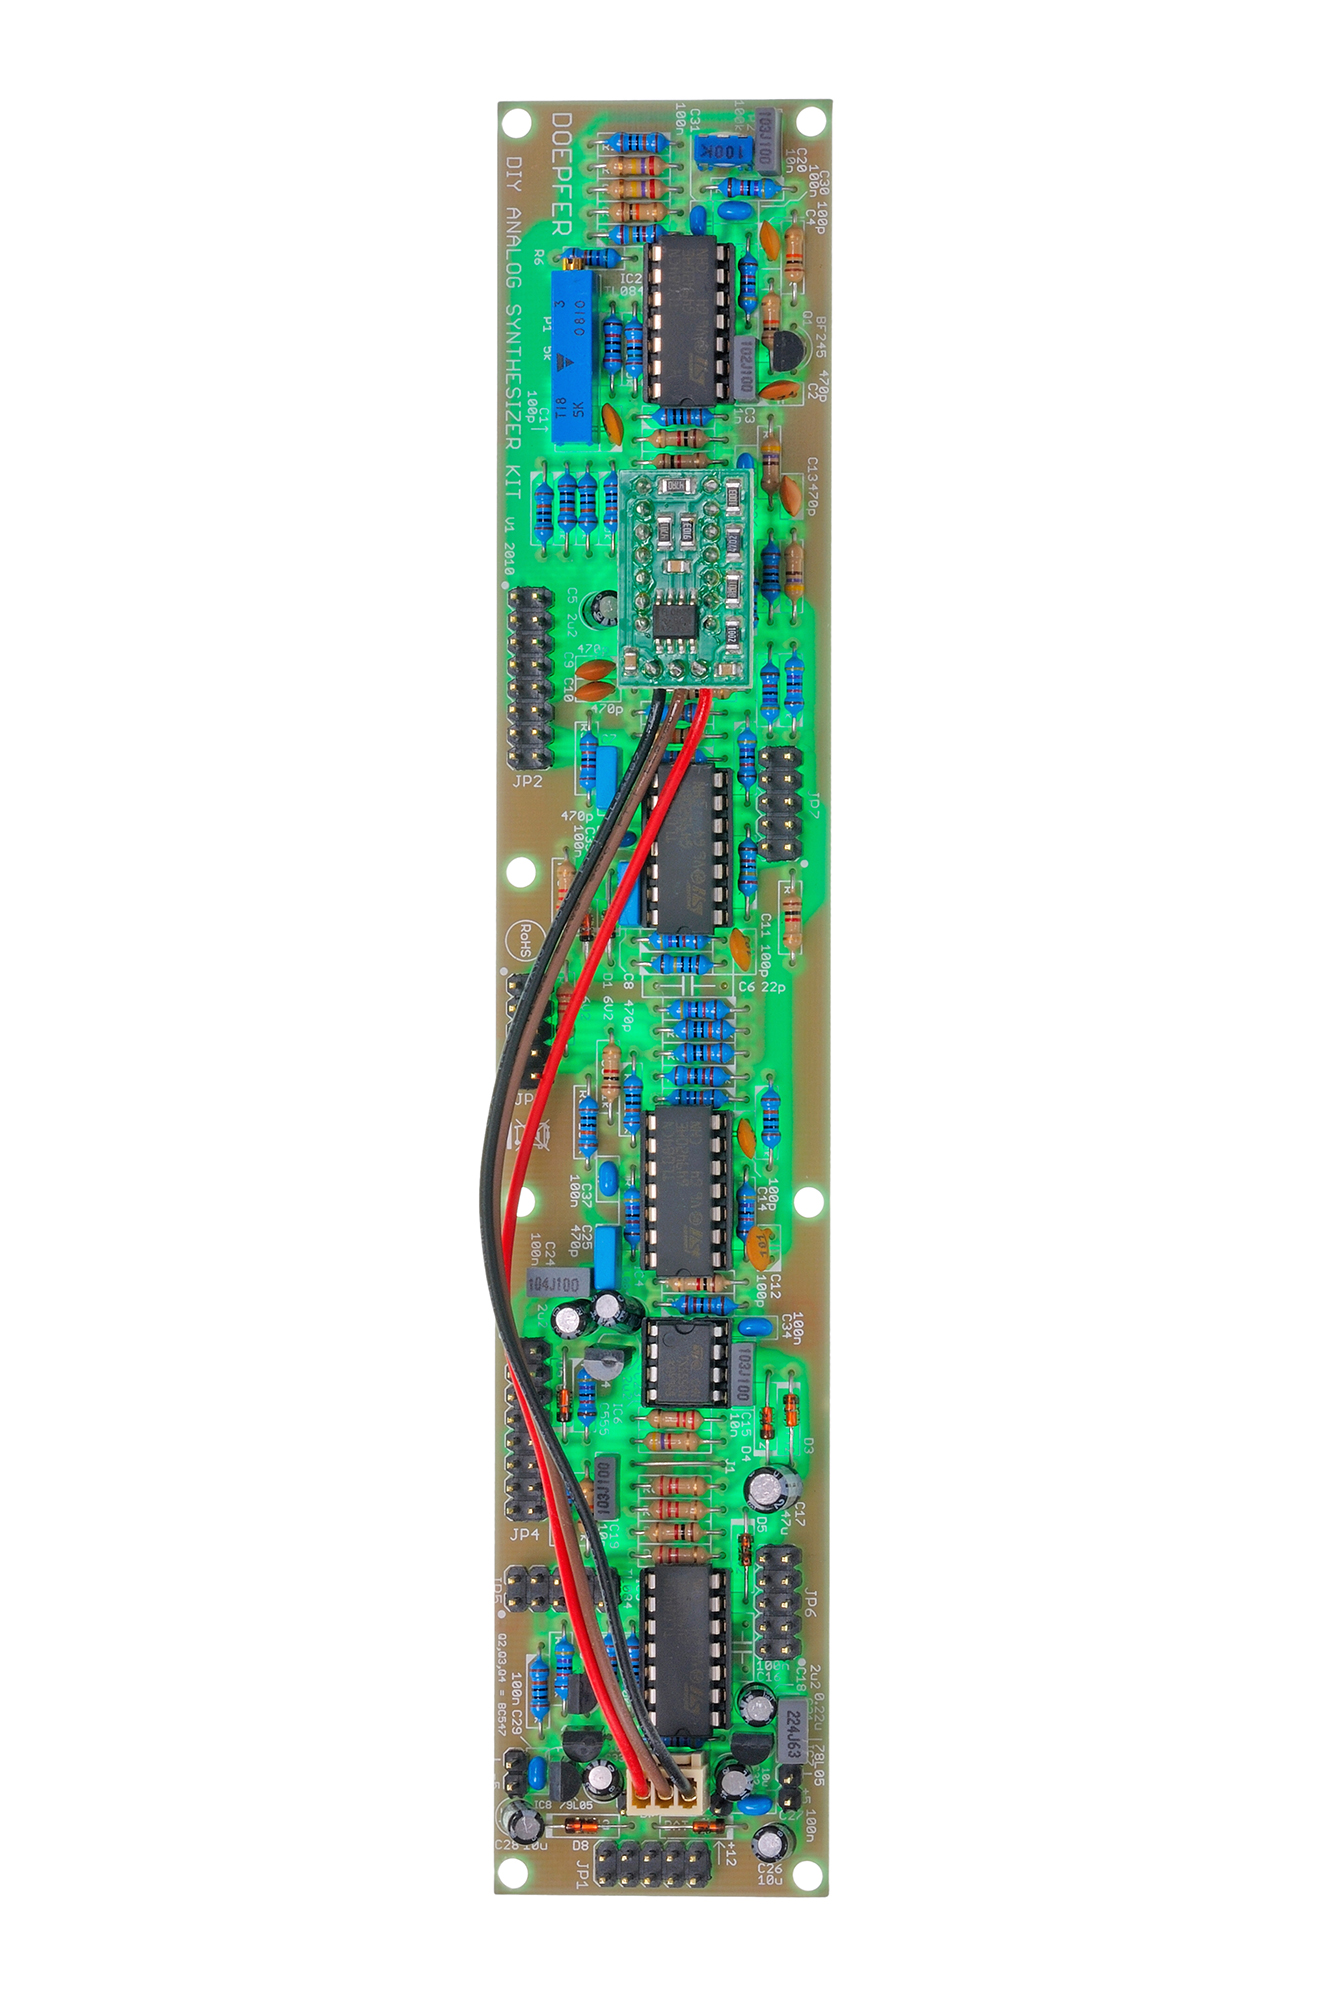 doepfer diy synthesizer kit no tempco the synthesizer network. Black Bedroom Furniture Sets. Home Design Ideas